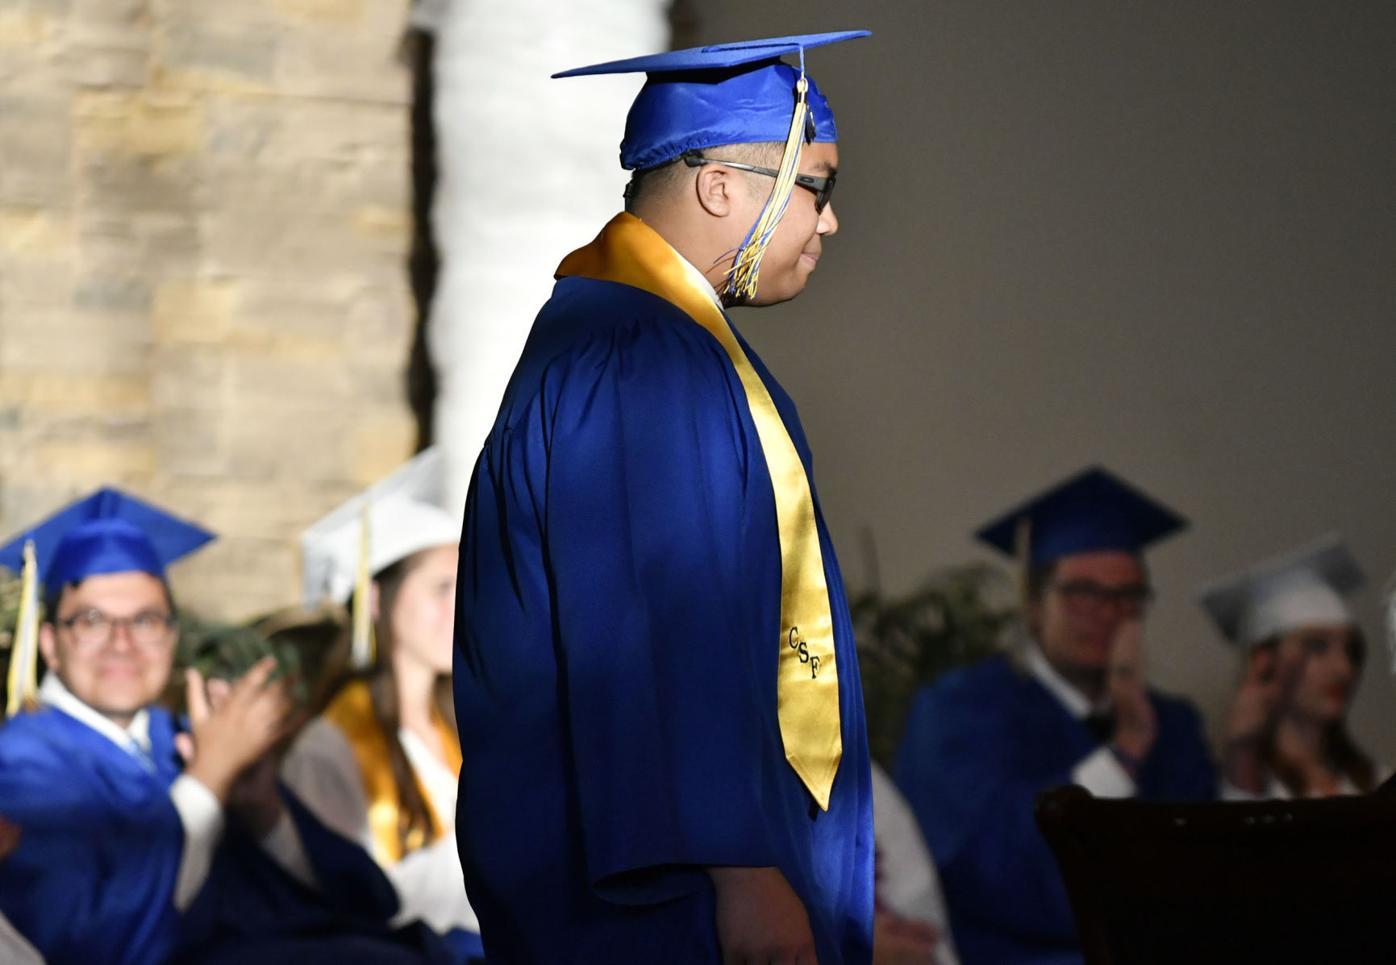 060818 VCA graduation 02.jpg